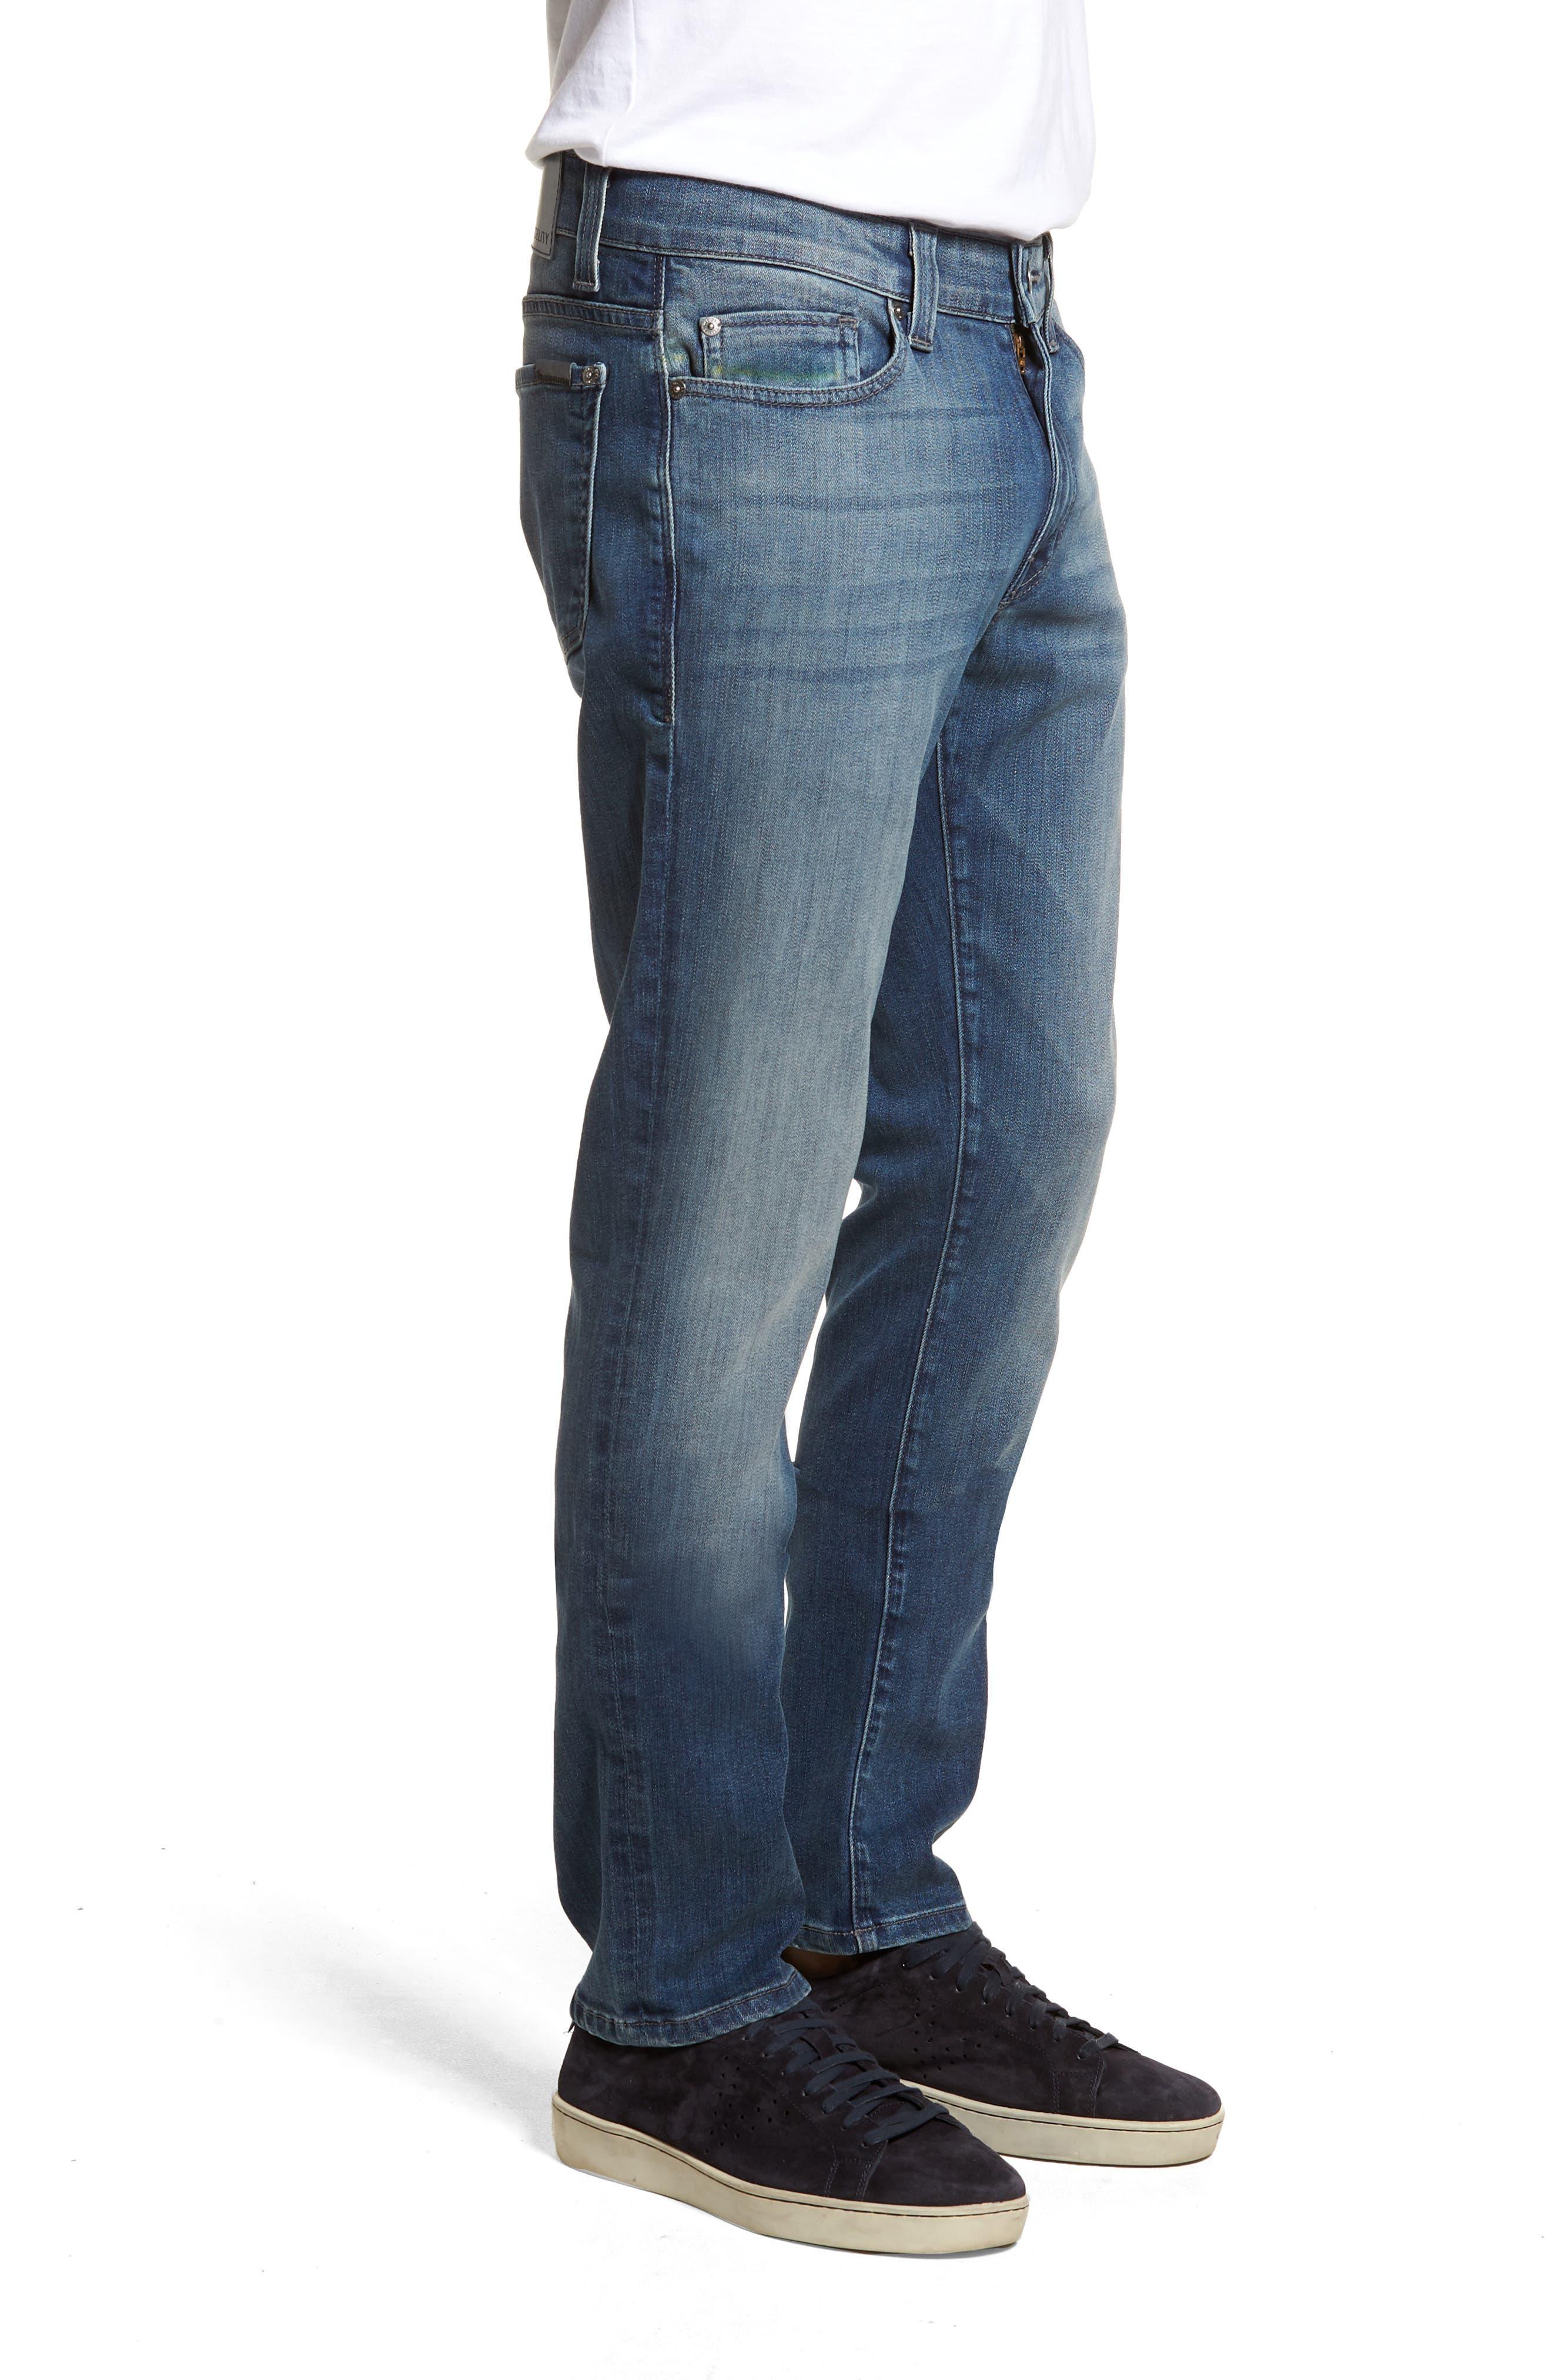 FIDELITY DENIM,                             Torino Slim Fit Jeans,                             Alternate thumbnail 3, color,                             400